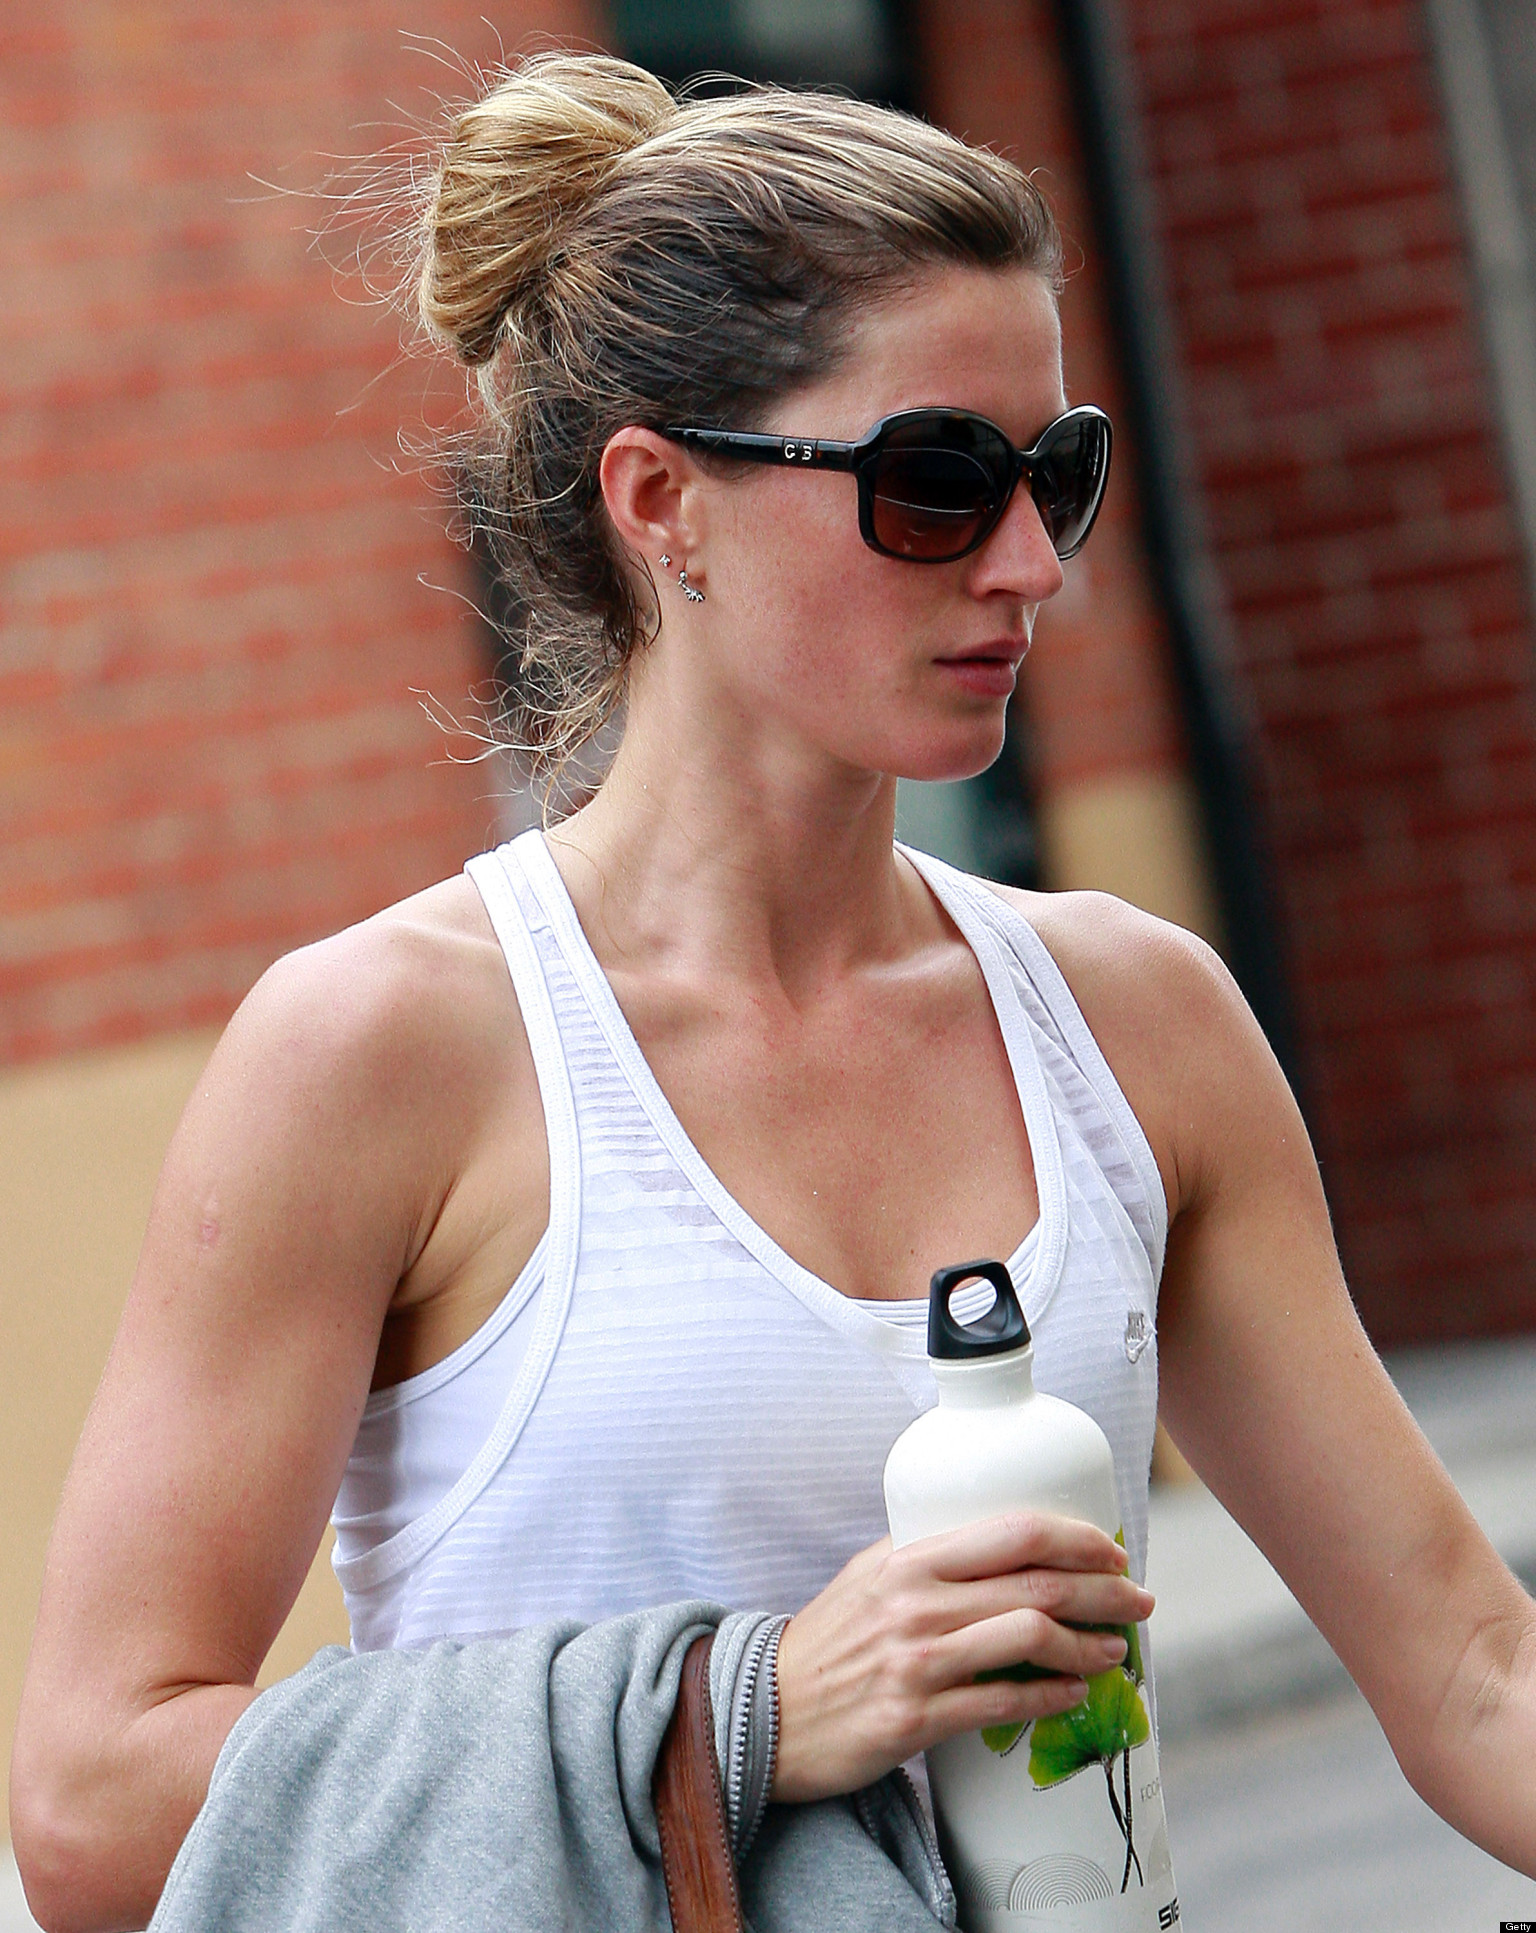 Gisele Bundchen's Baby Girl Is The Perfect Yoga Partner ... Gisele Bundchen Facebook